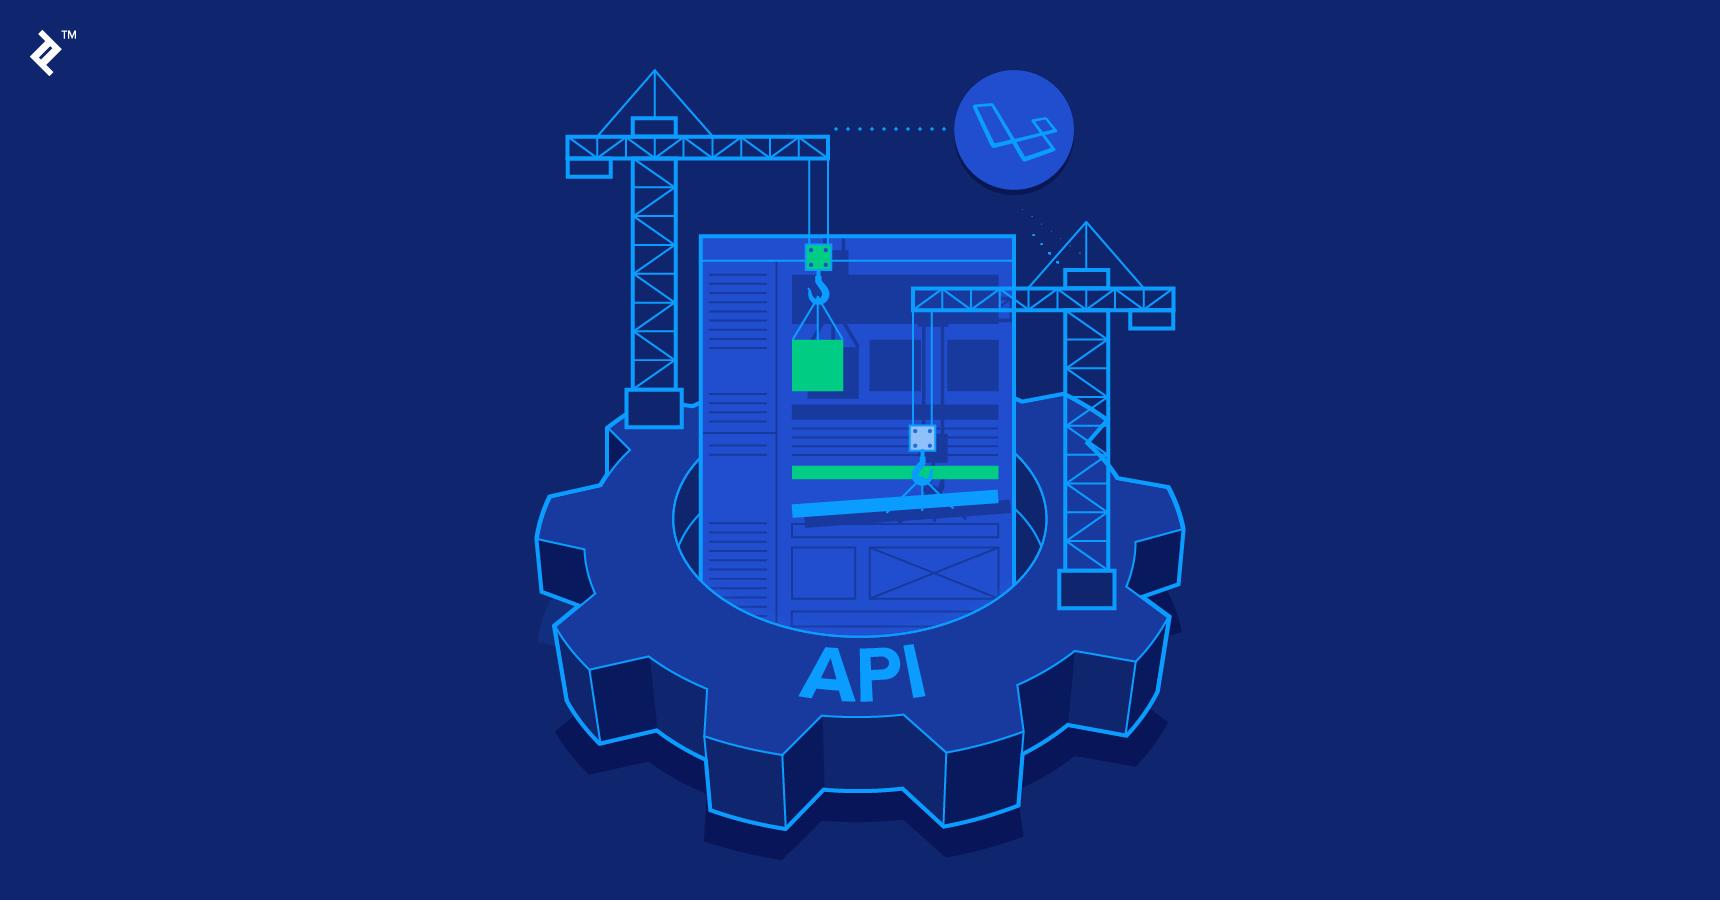 jmeter rest api testing tutorial